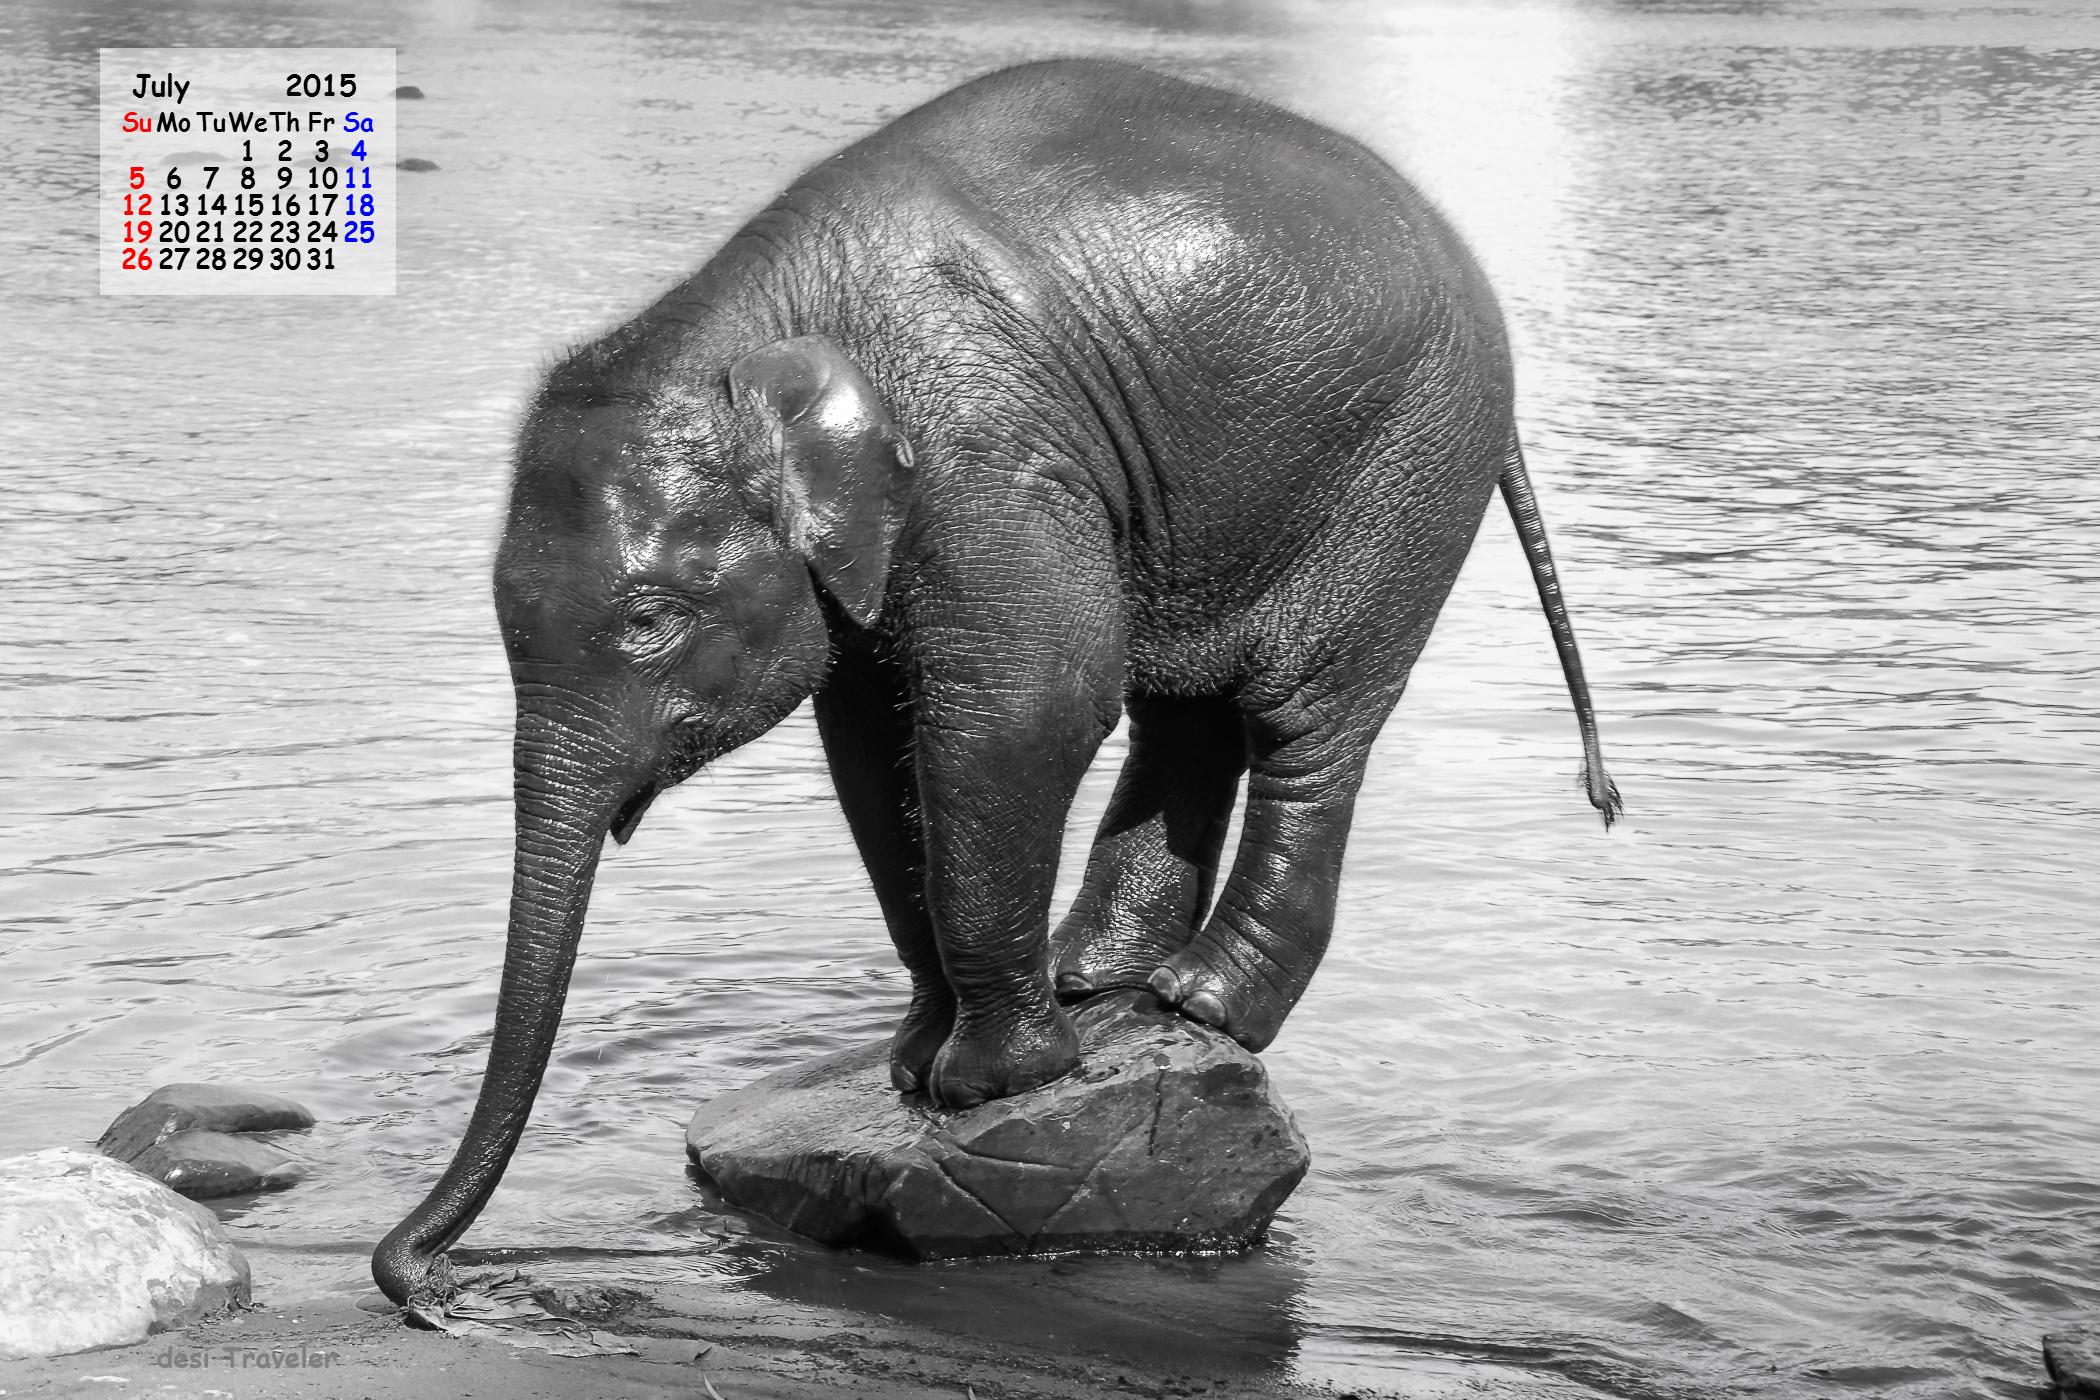 Calendar Wallpaper July 2015 : July calendar desktop download with baby elephant